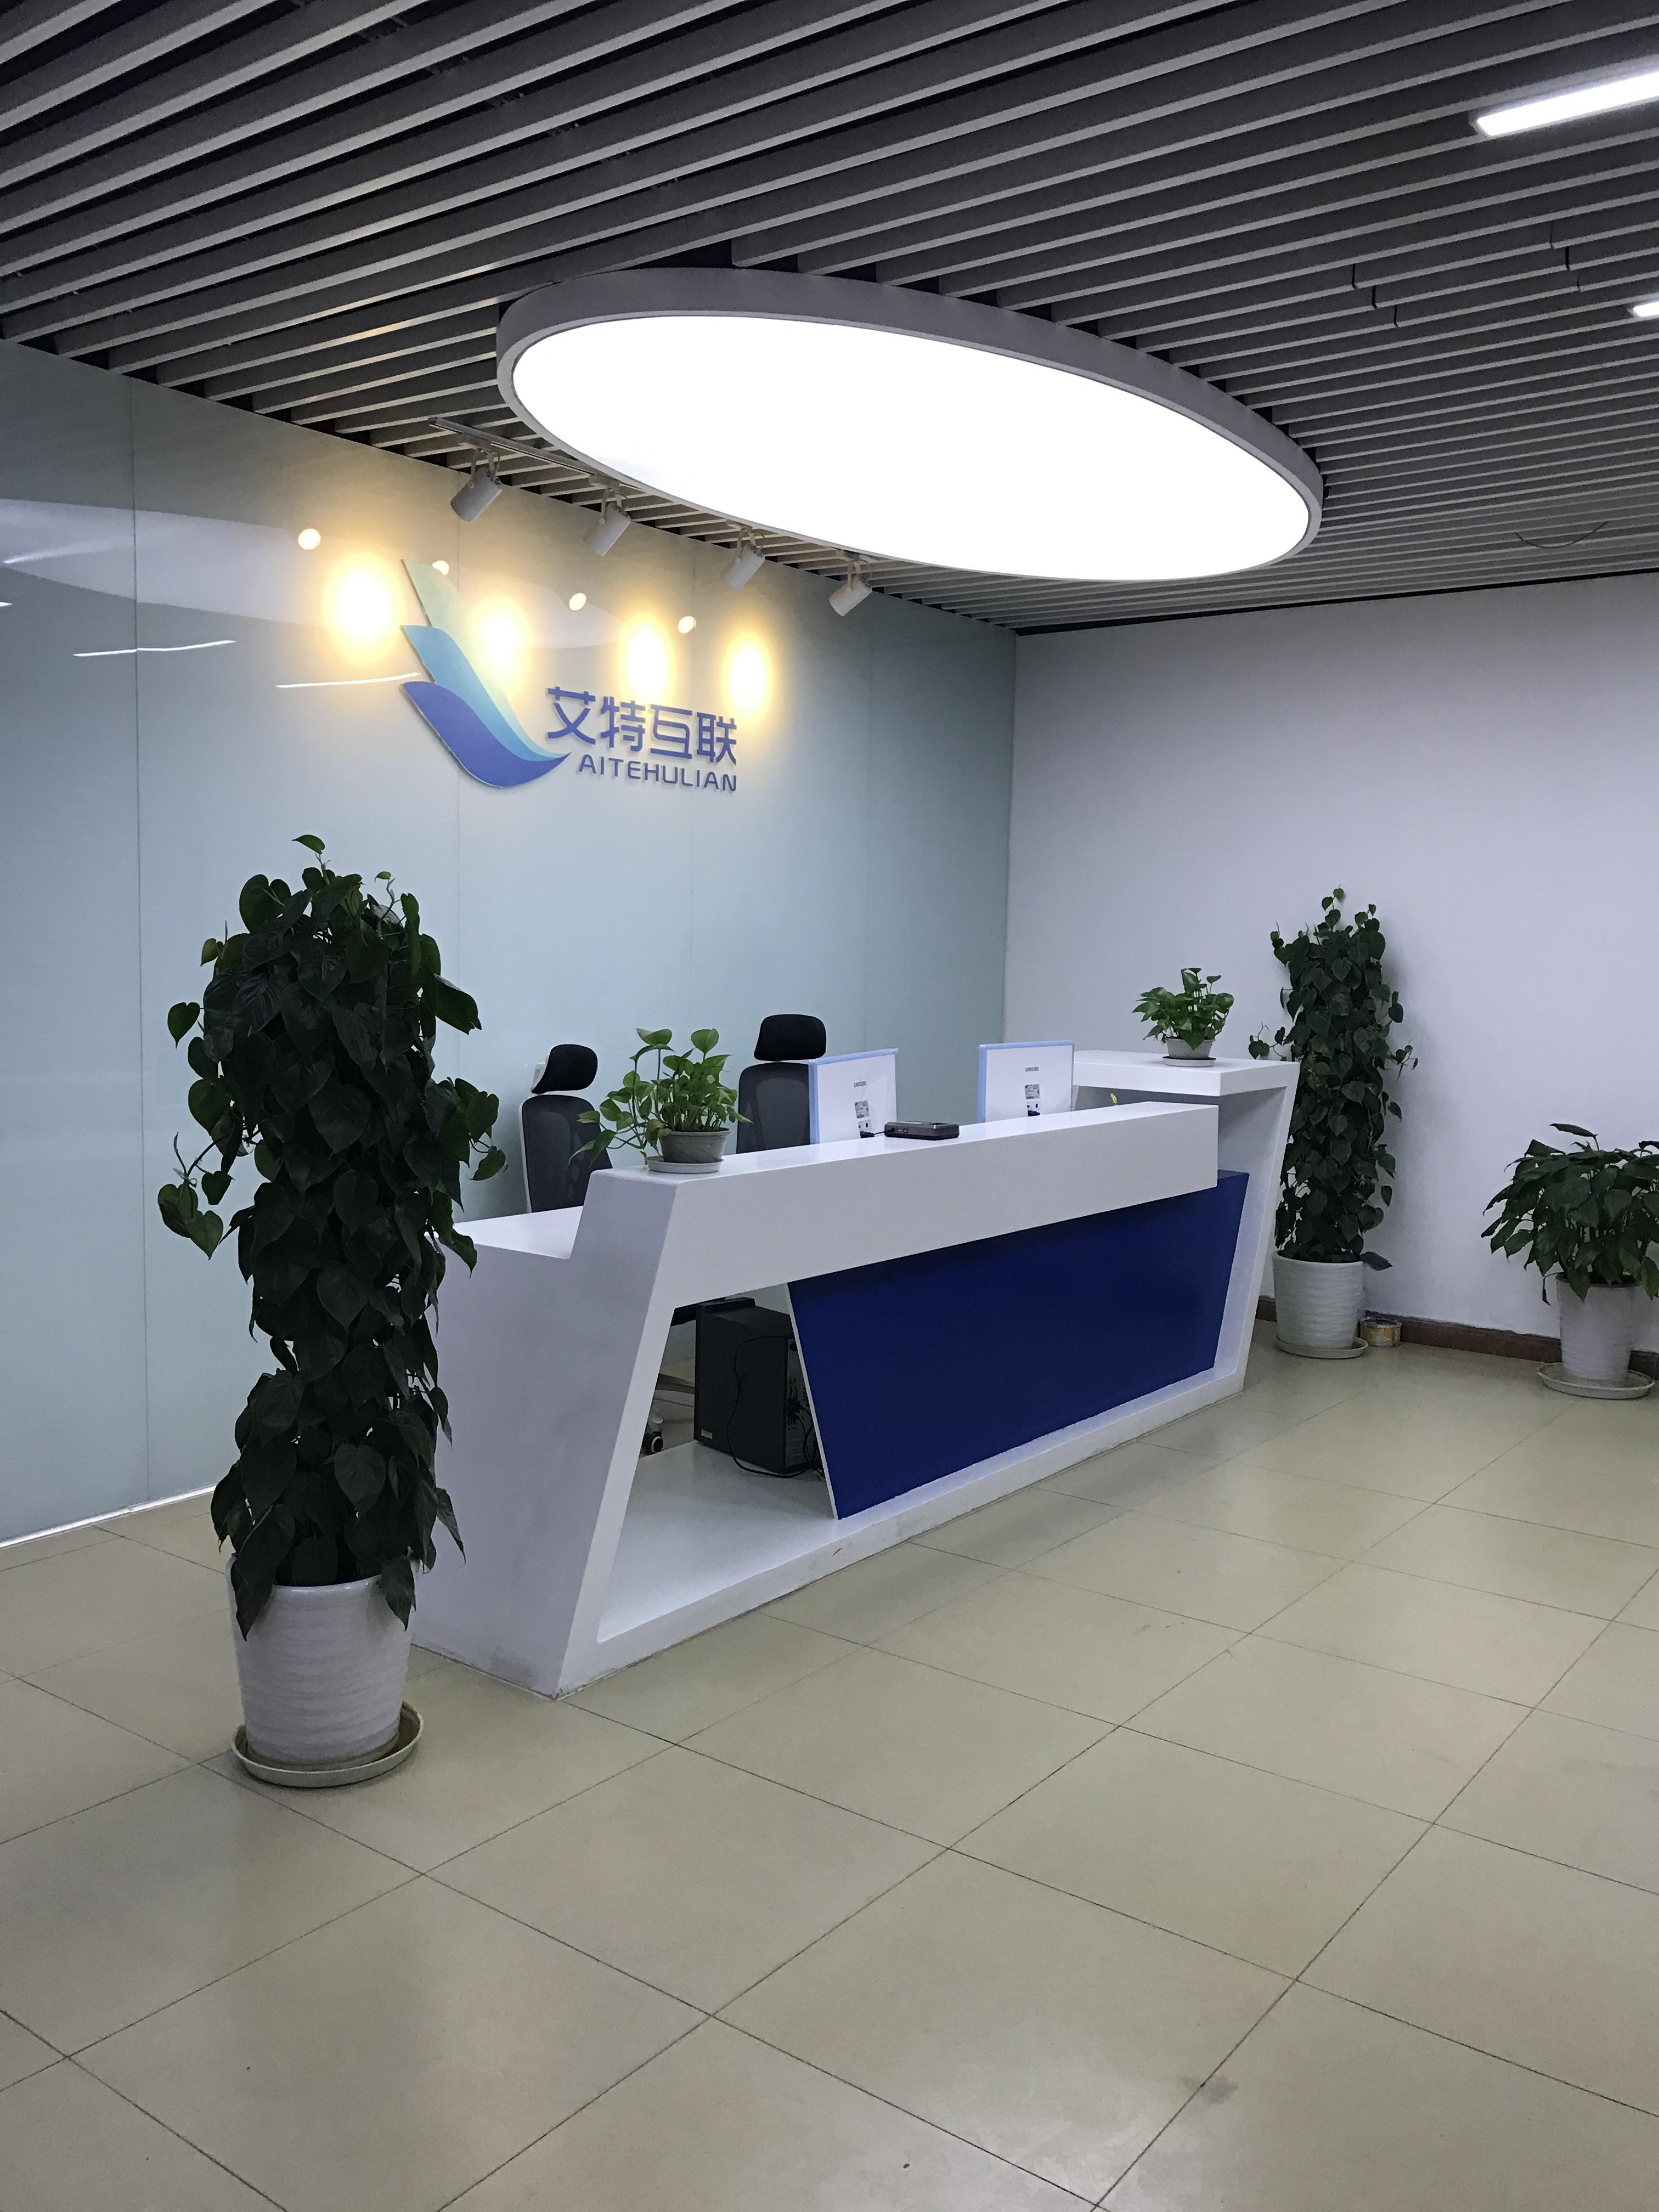 java大数据H5全栈培训招河南招生代理